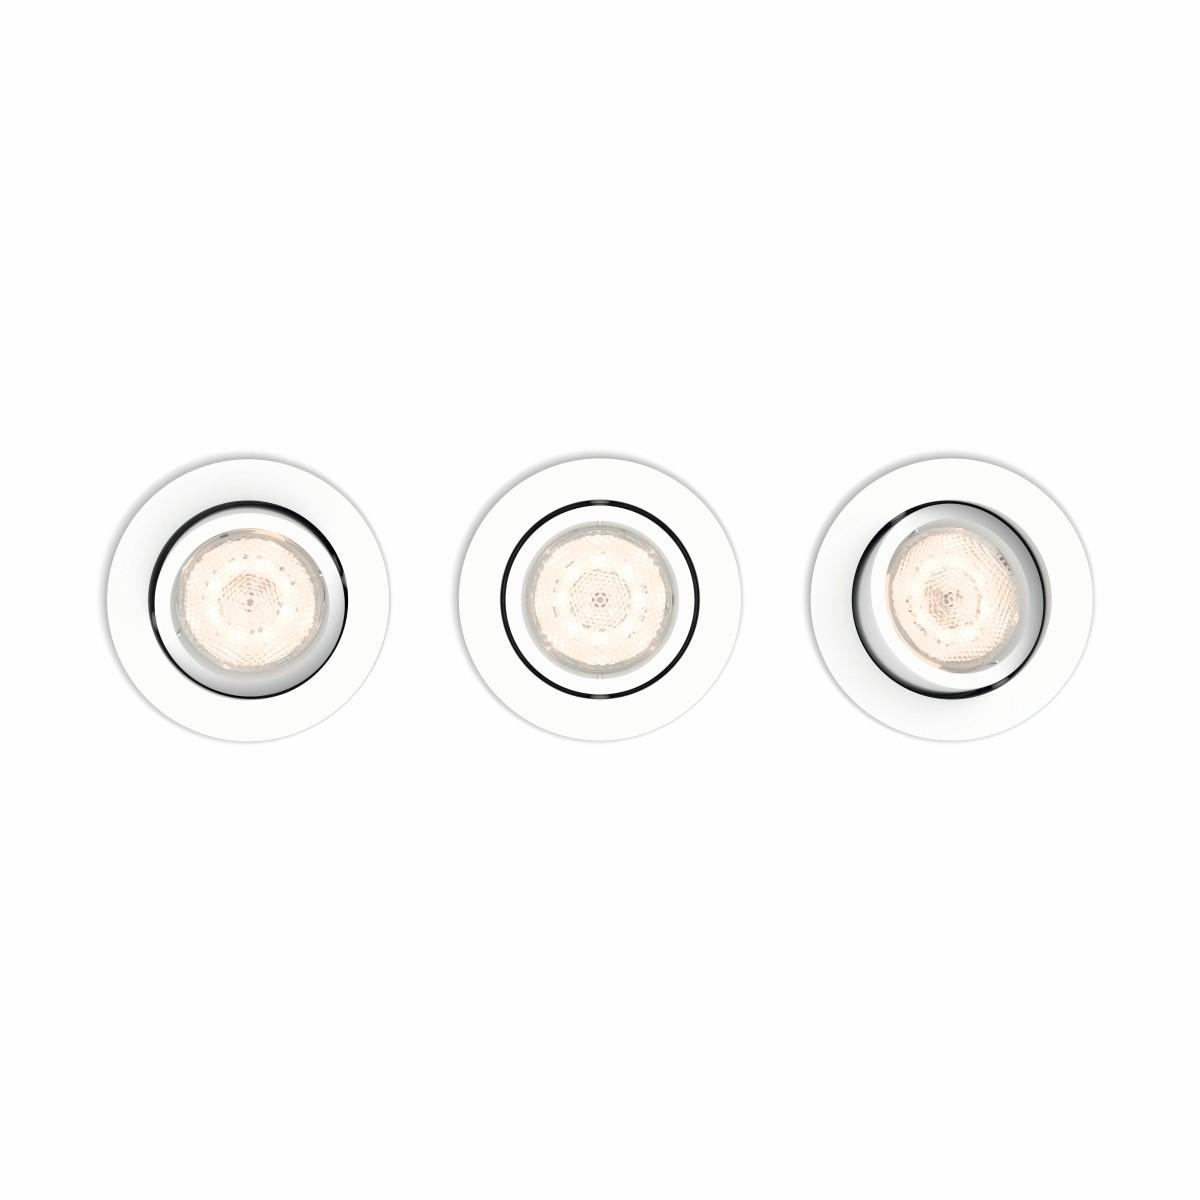 Philips Lighting Shellbark 5020331P0 LED-inbouwlamp Set van 3 13.5 W Warm-wit Wit